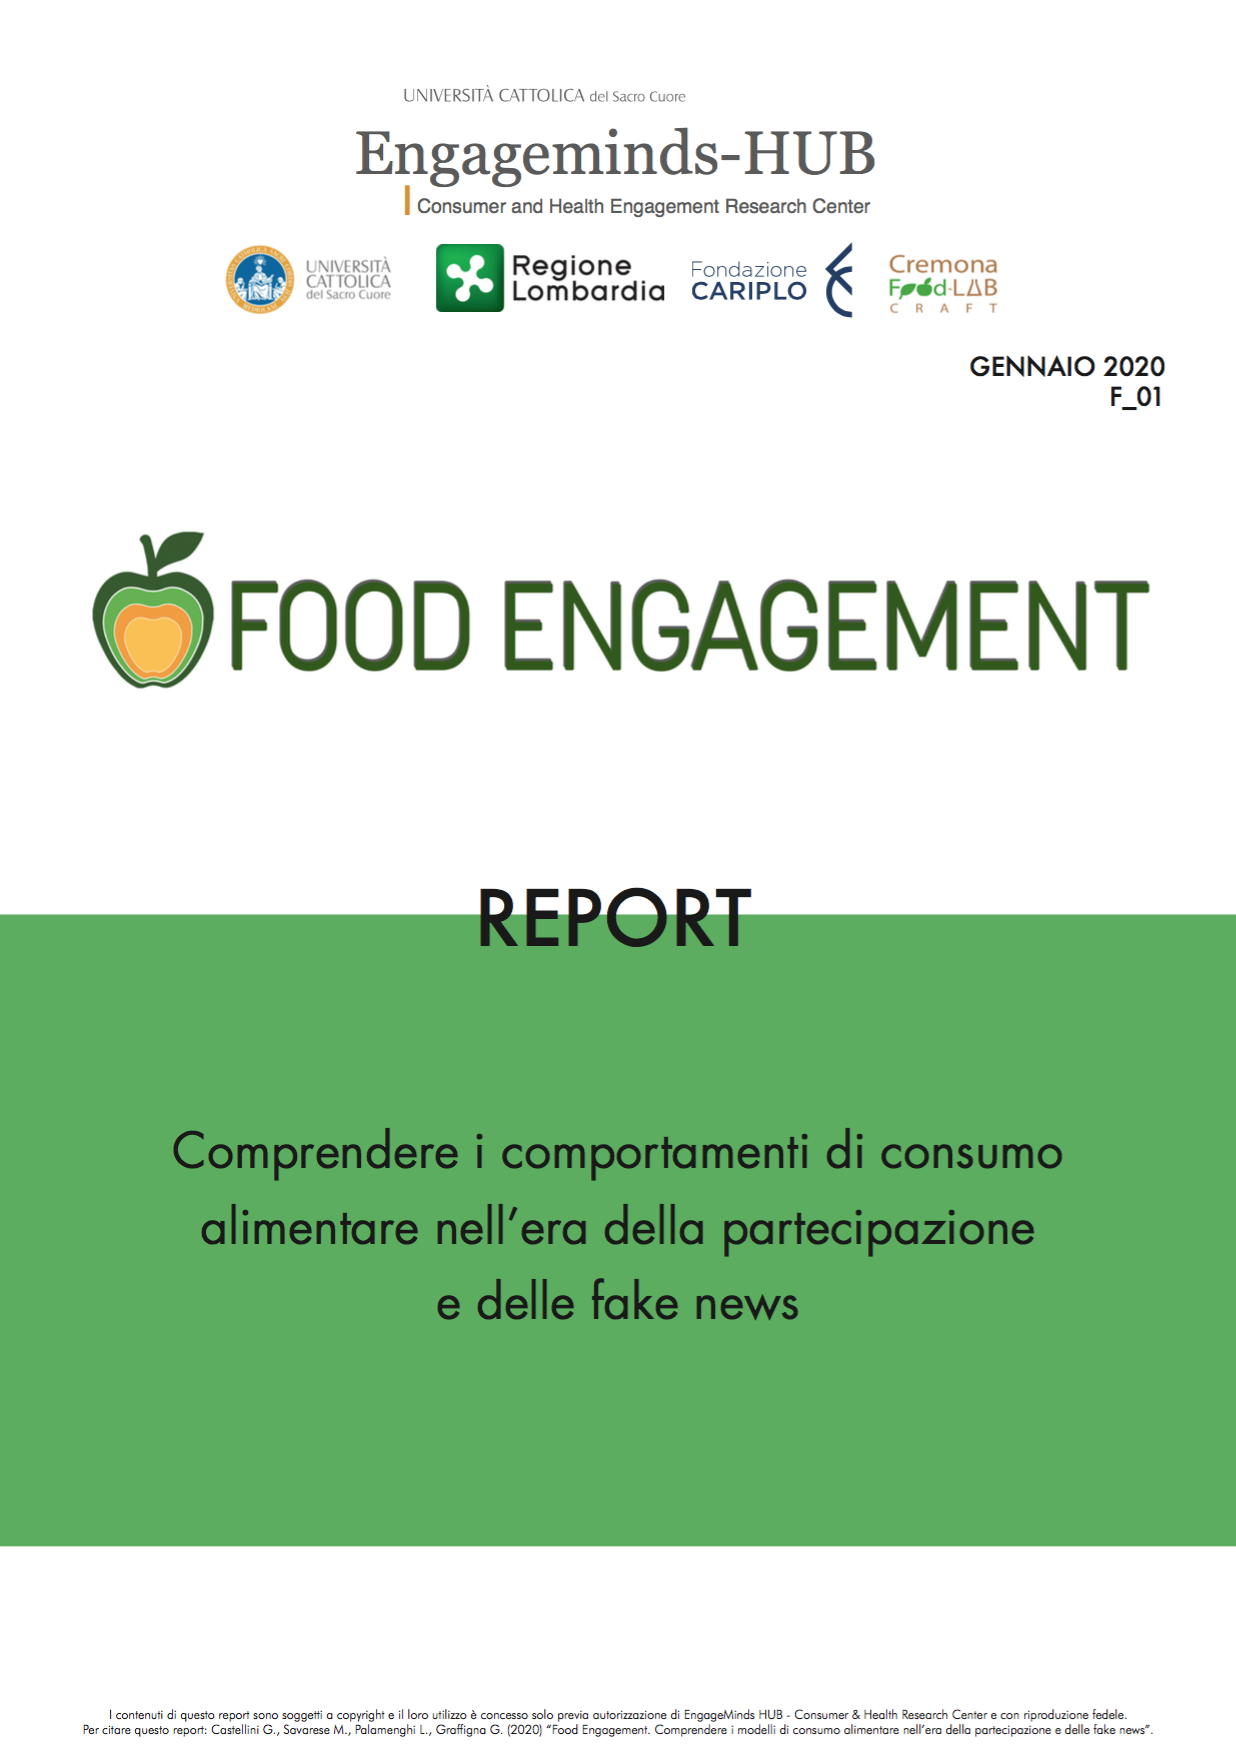 FOOD ENGAGEMENT